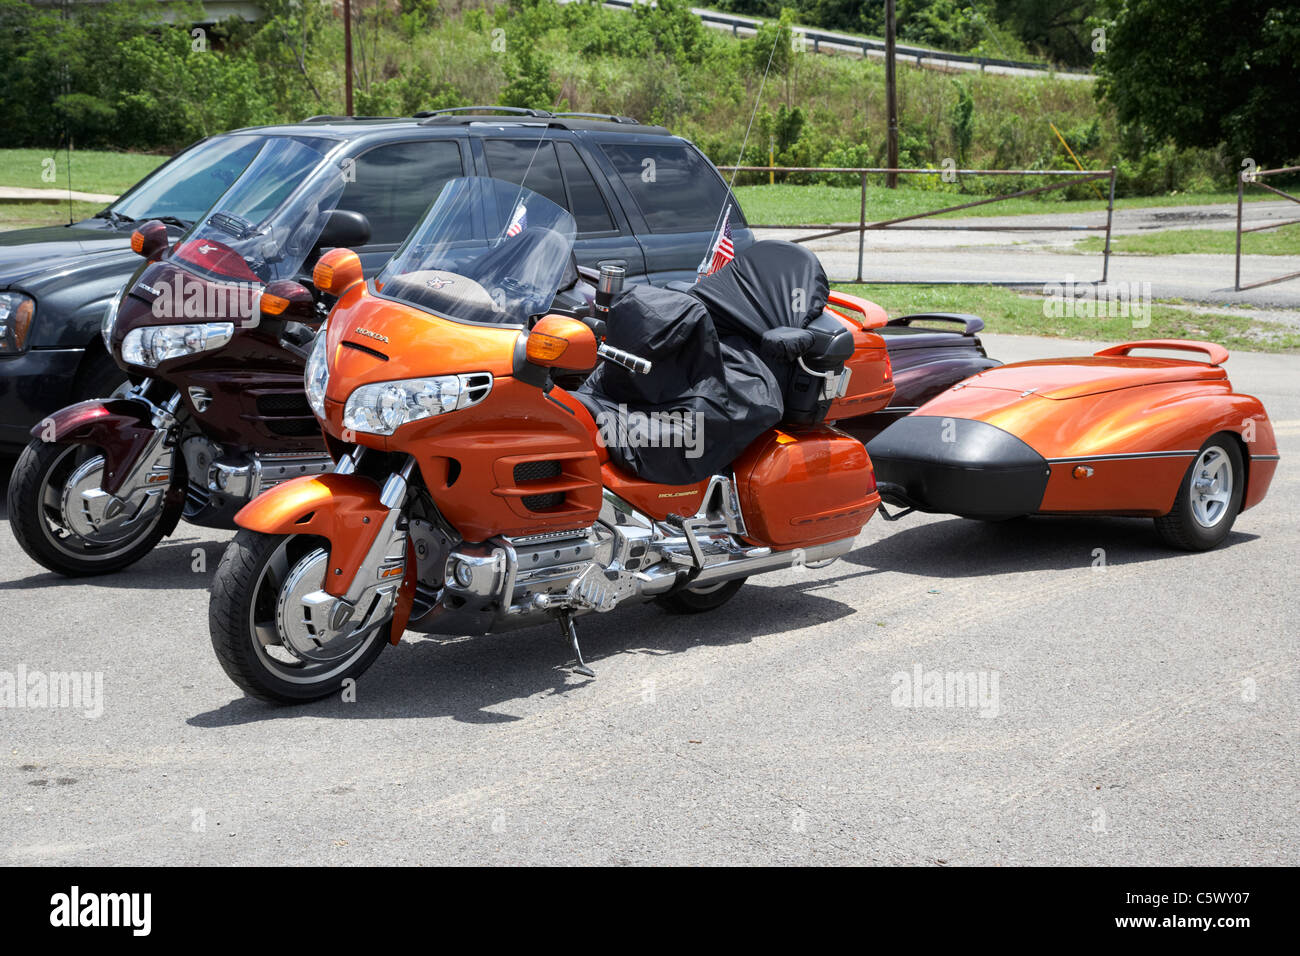 honda goldwing touring motorbikes with trailer Lynchburg , tennessee , usa Stock Photo